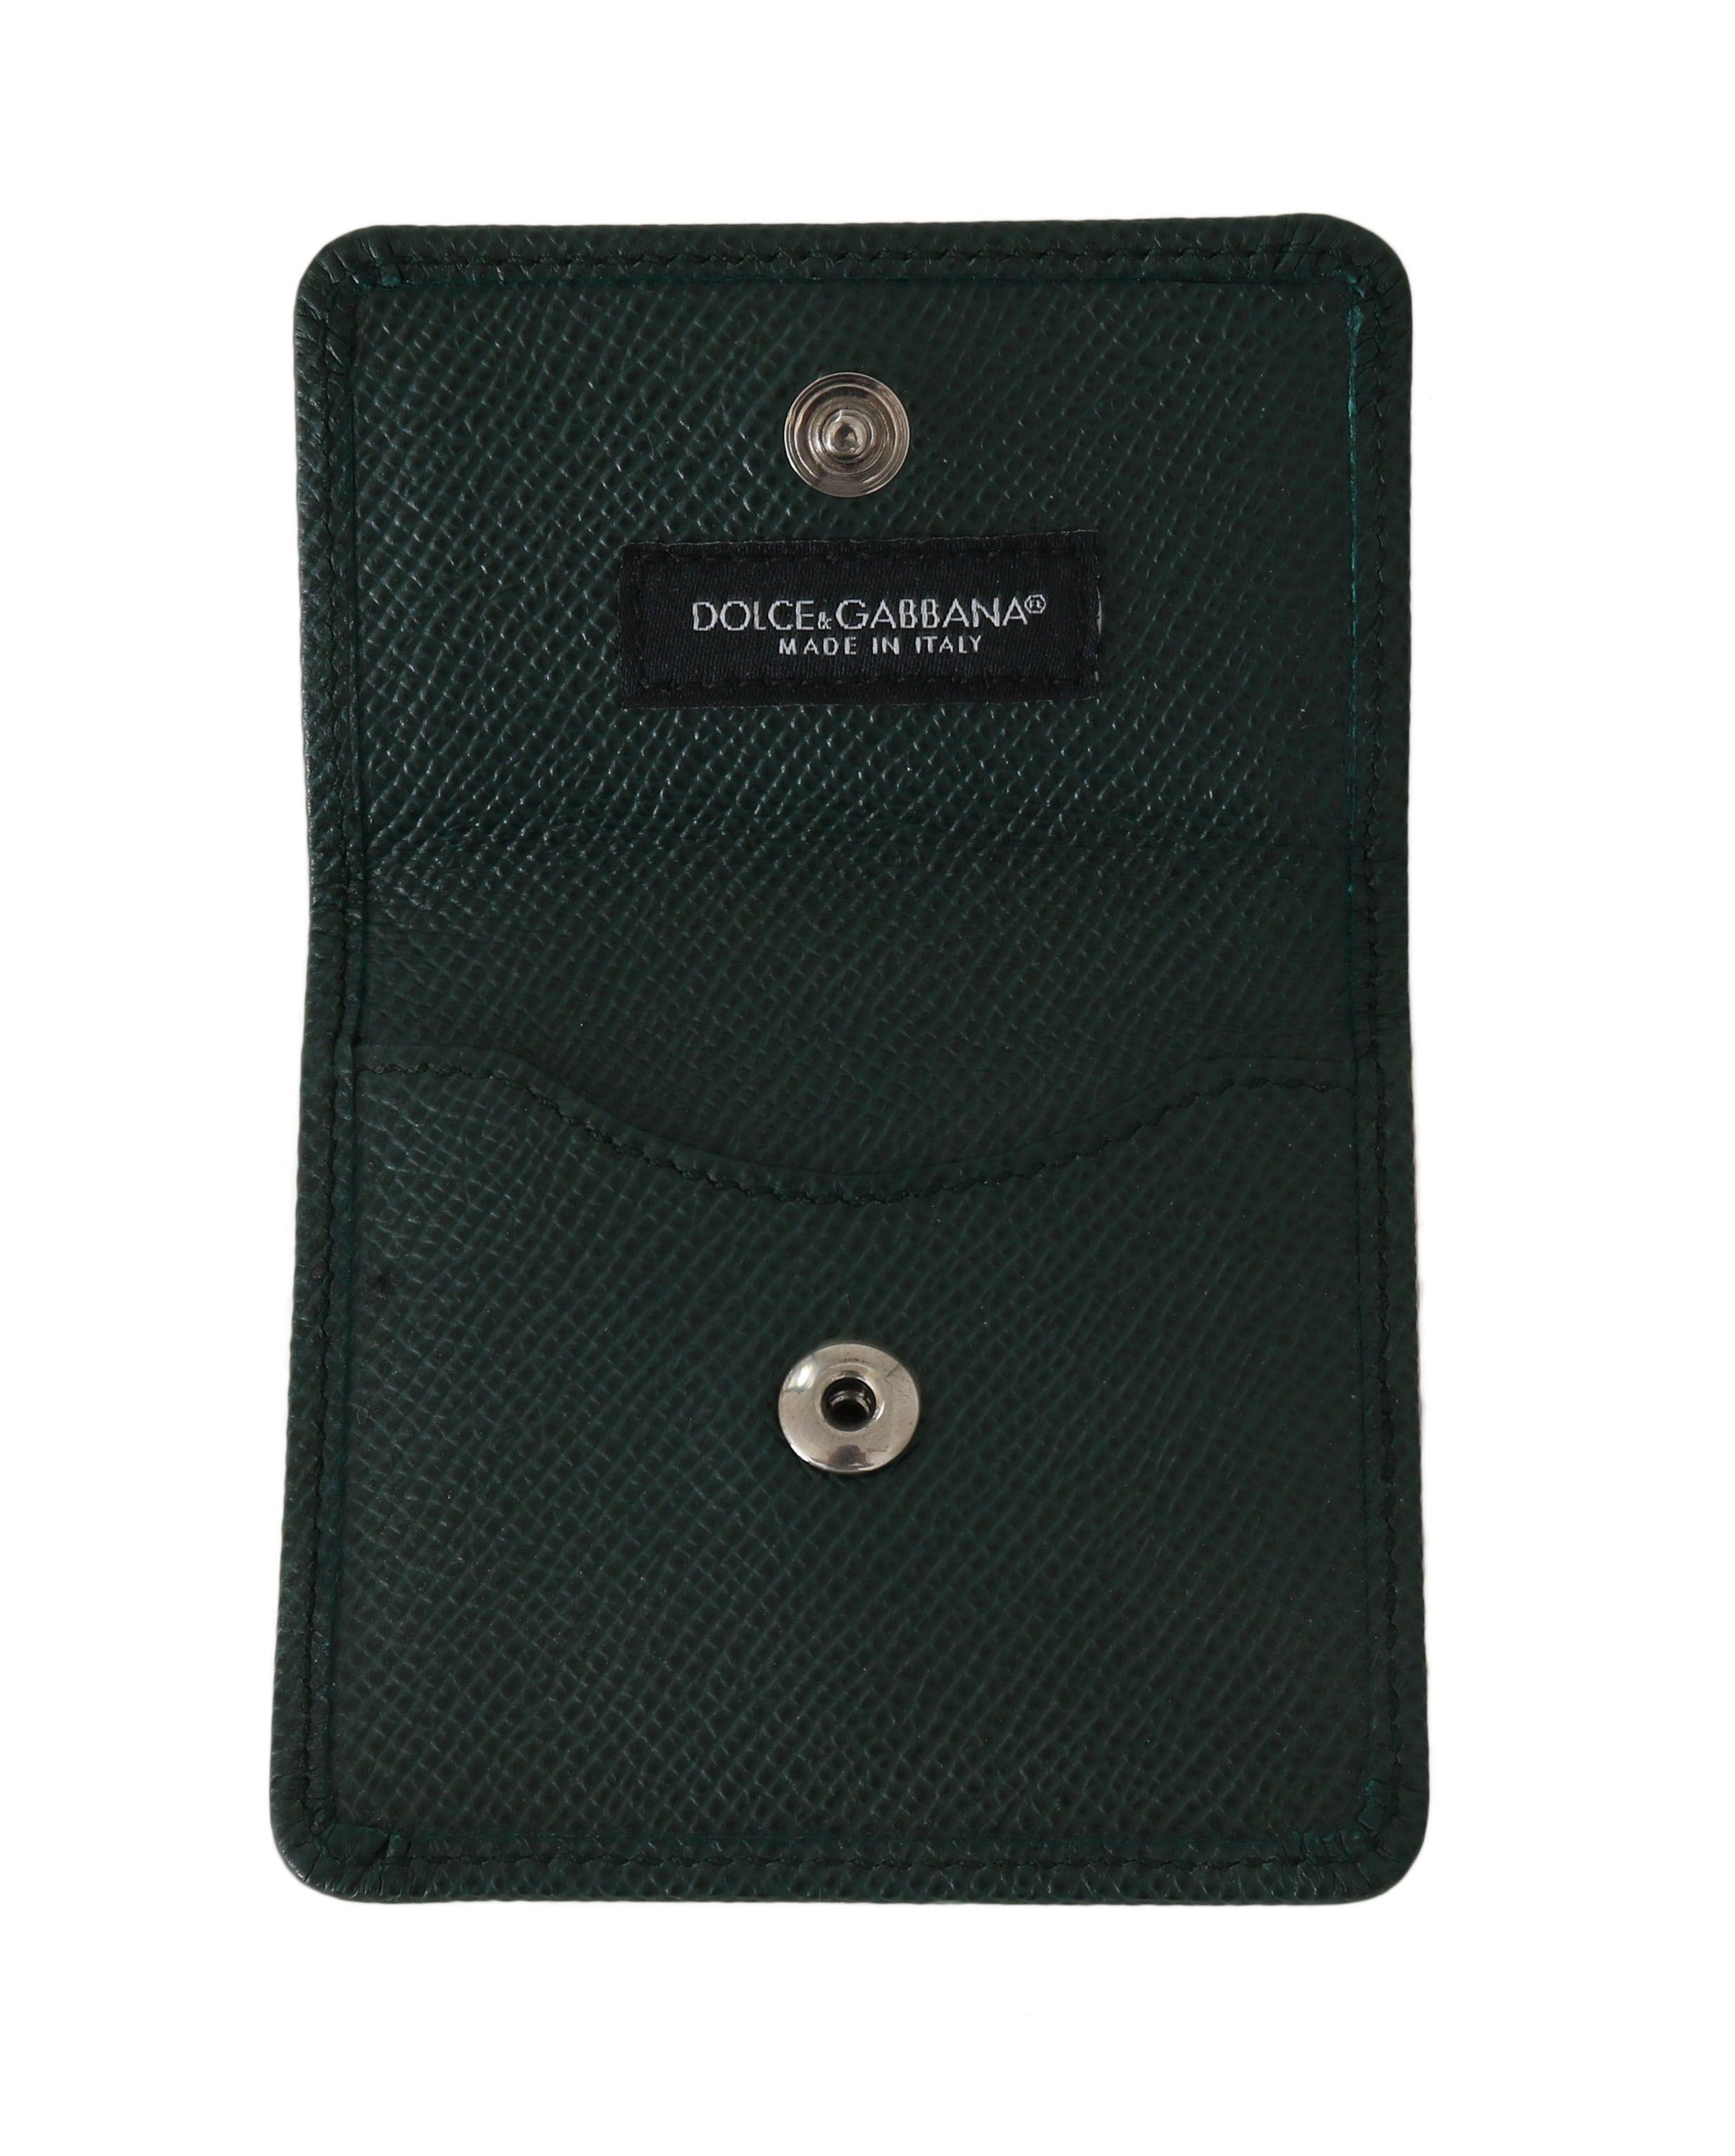 Dolce & Gabbana Green Dauphine Leather Case Holder